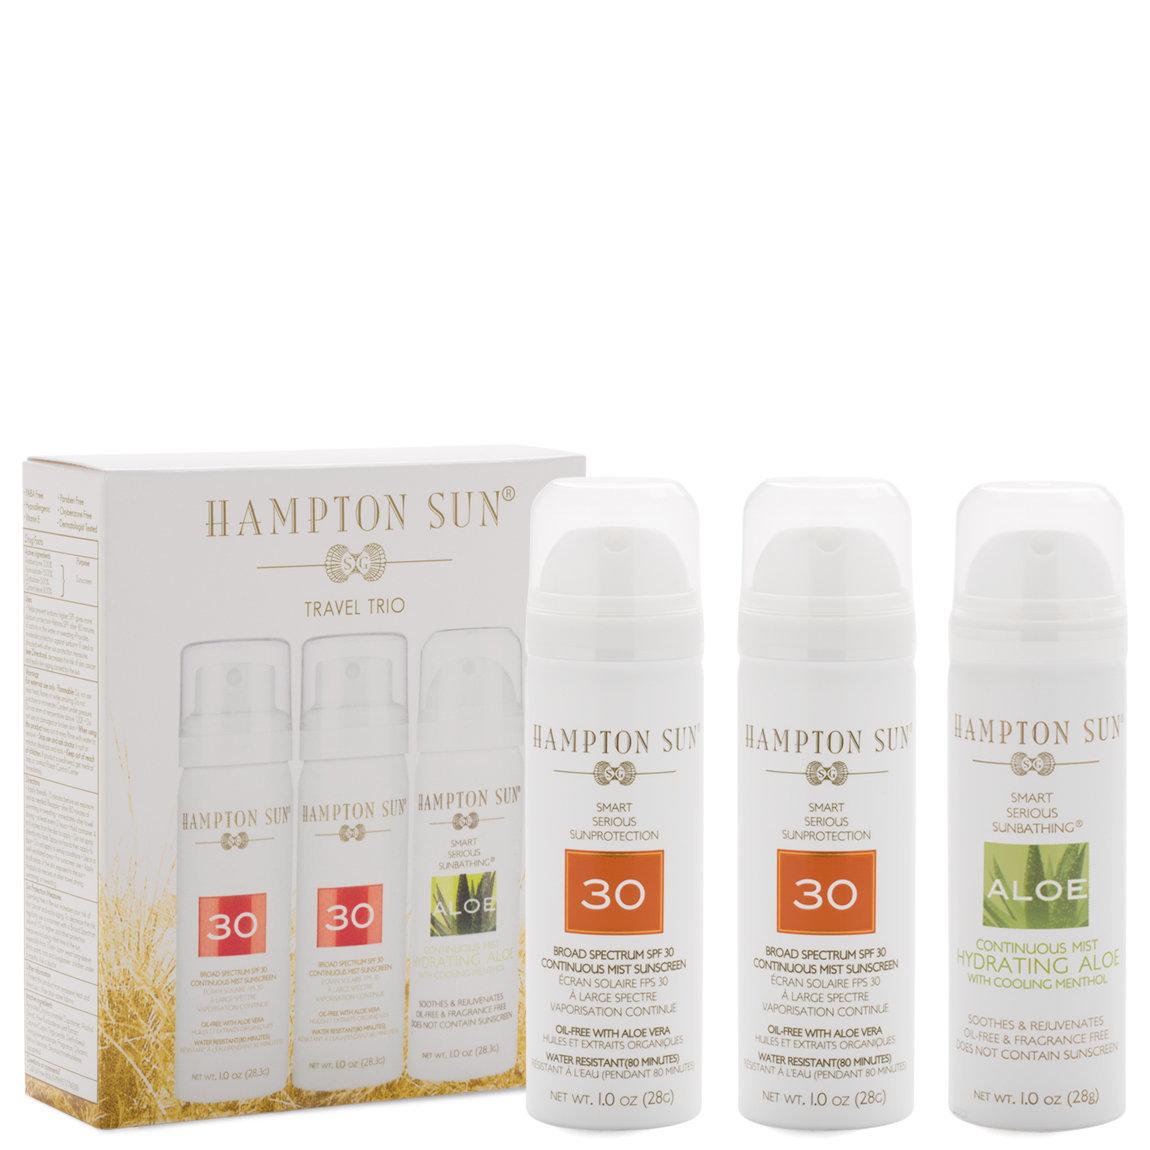 Hampton Sun Travel Trio product swatch.